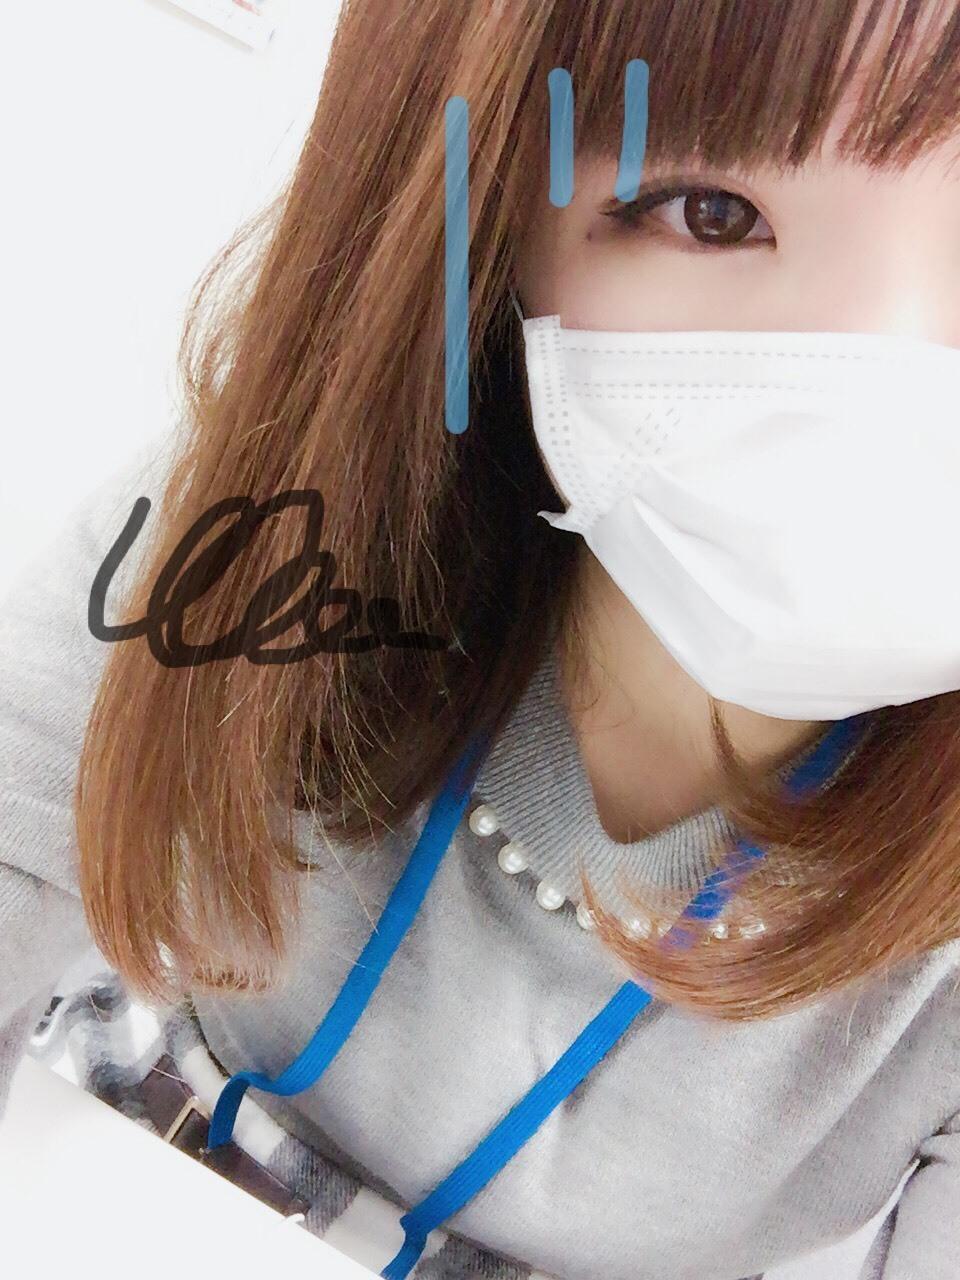 S__27459588.jpg